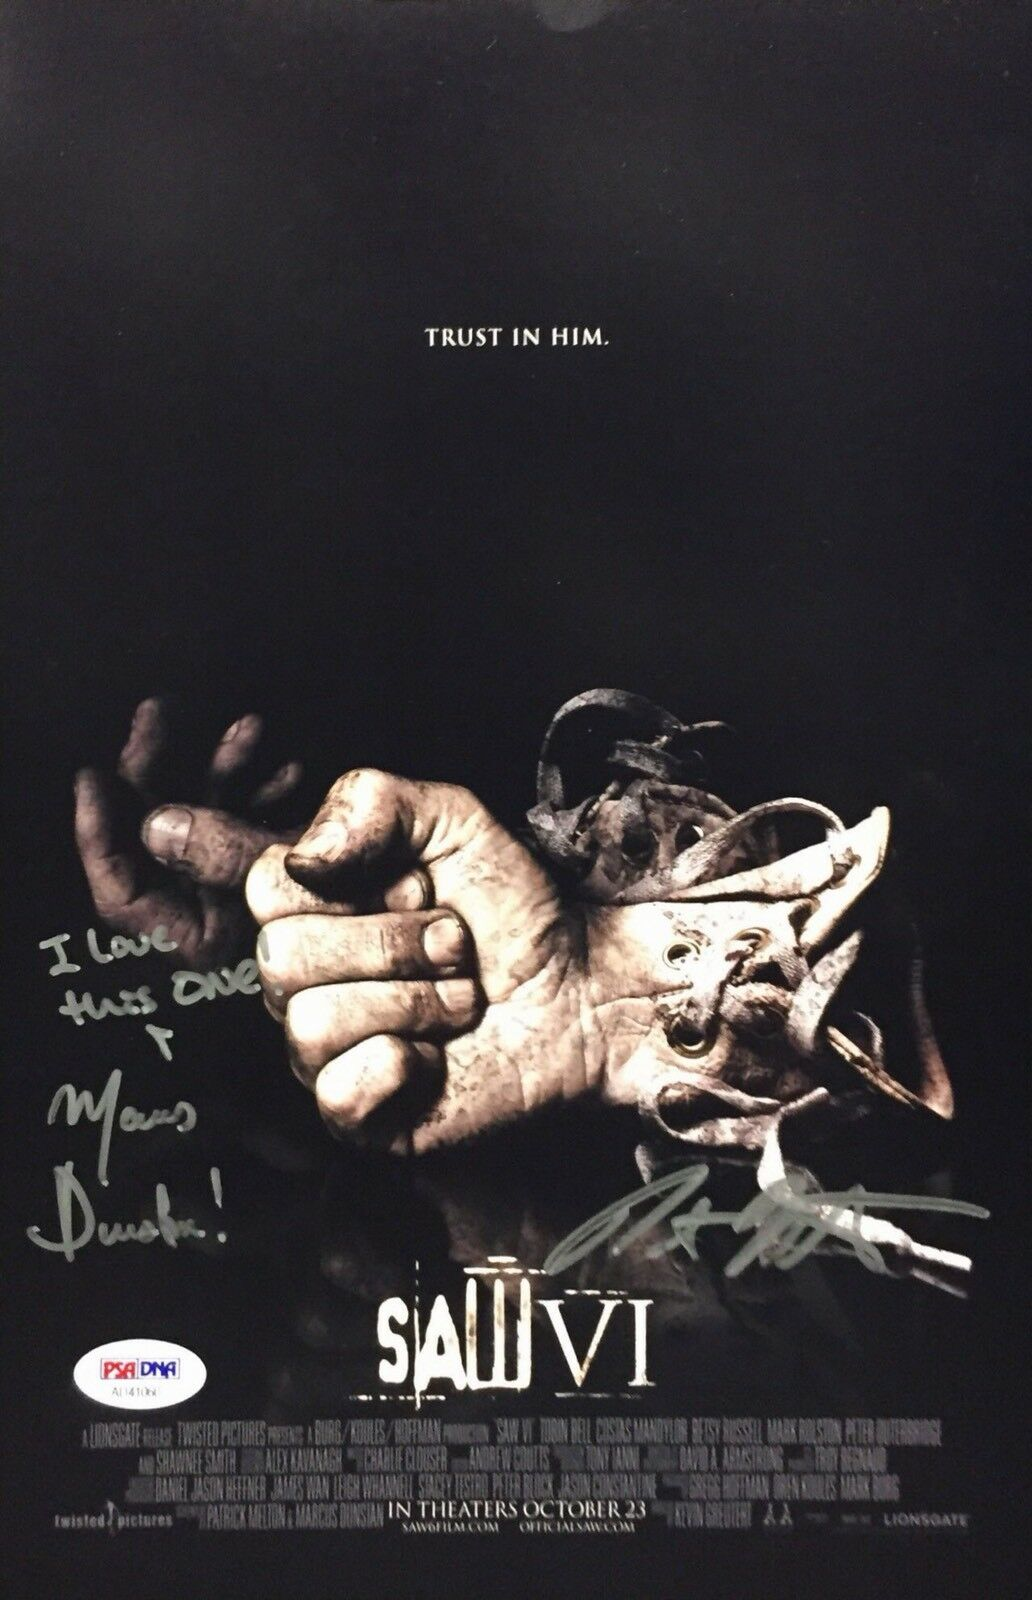 Marcus Dunstan & Patrick Melton Signed Saw VI 8x12 Photo *Writers PSA AD41060